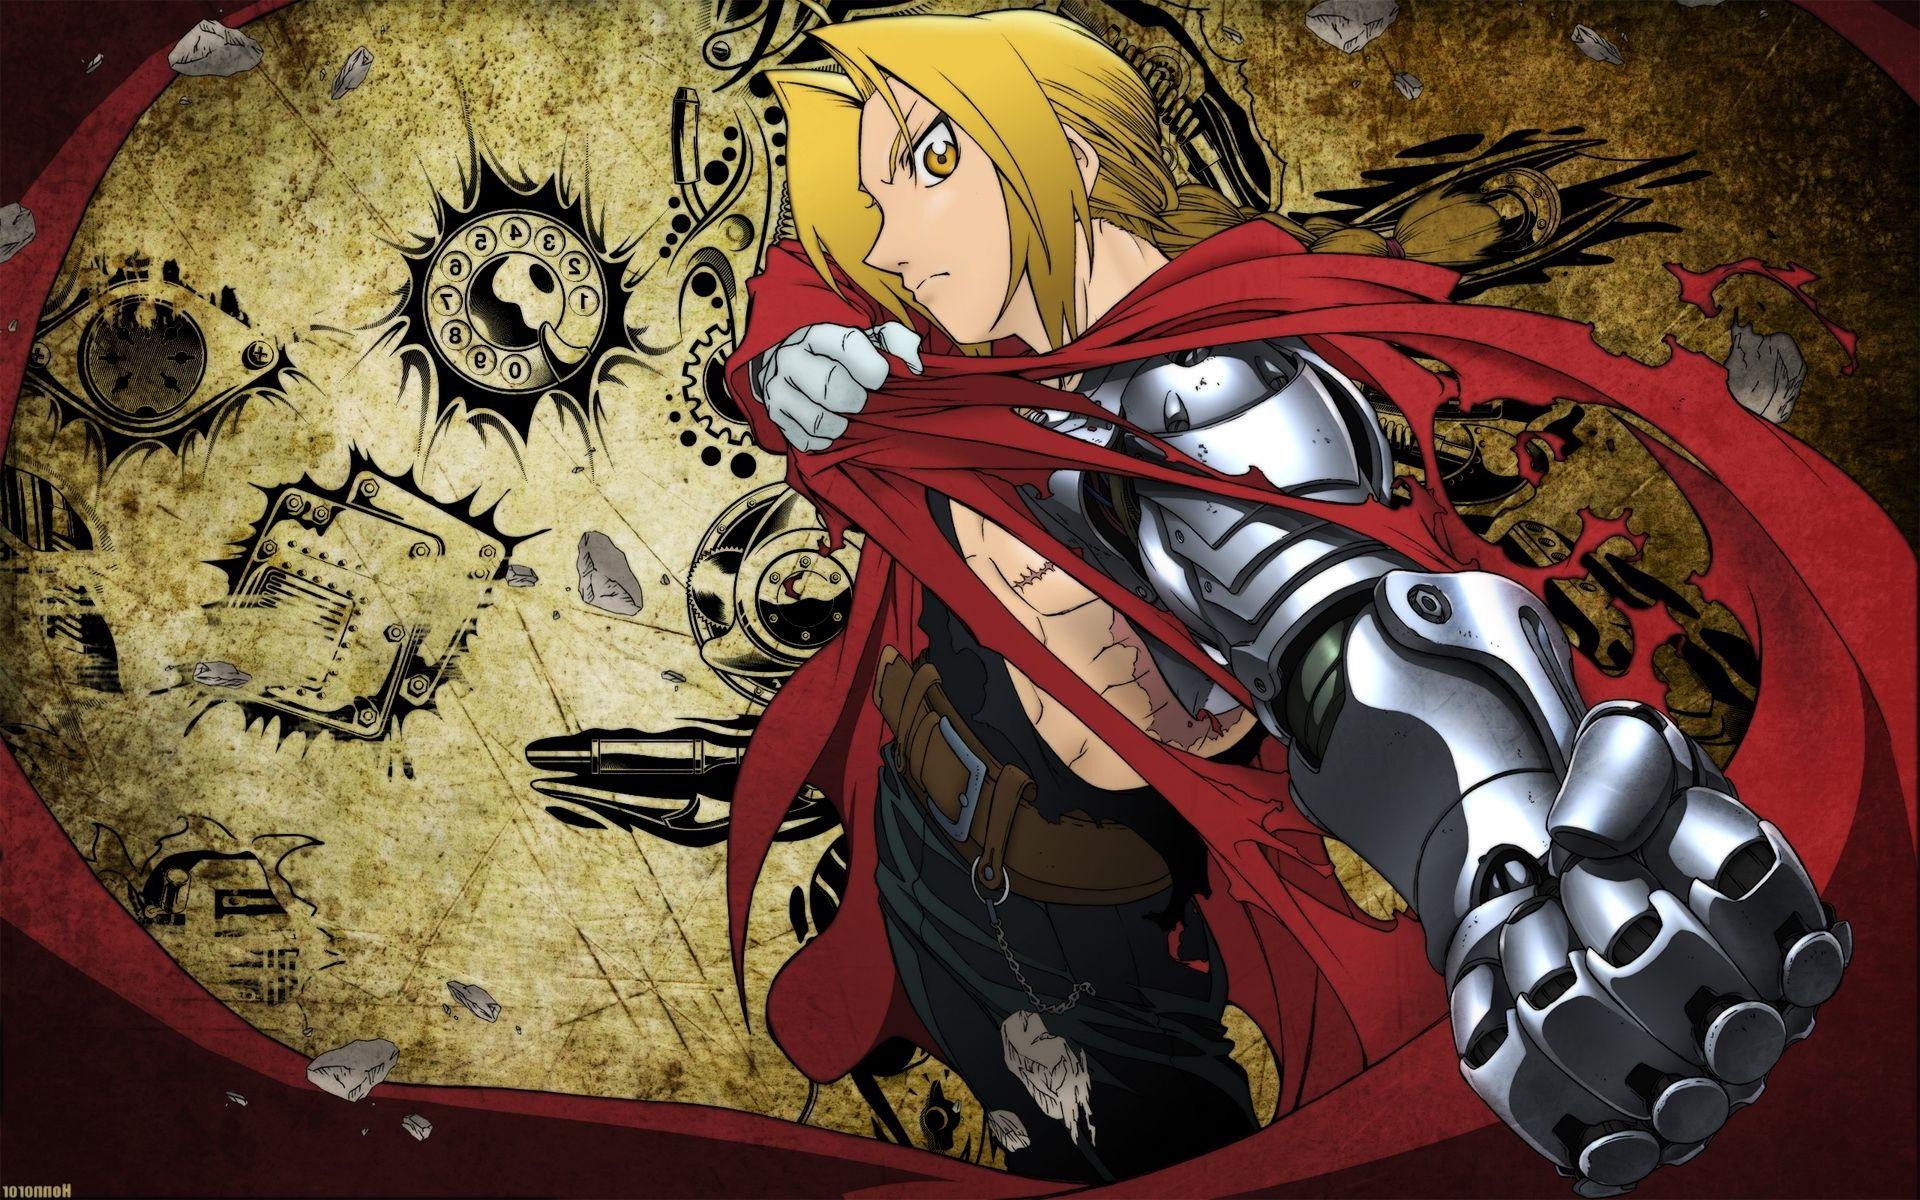 Fullmetal Alchemist Brotherhood Wallpaper Hd Posted By Ryan Thompson